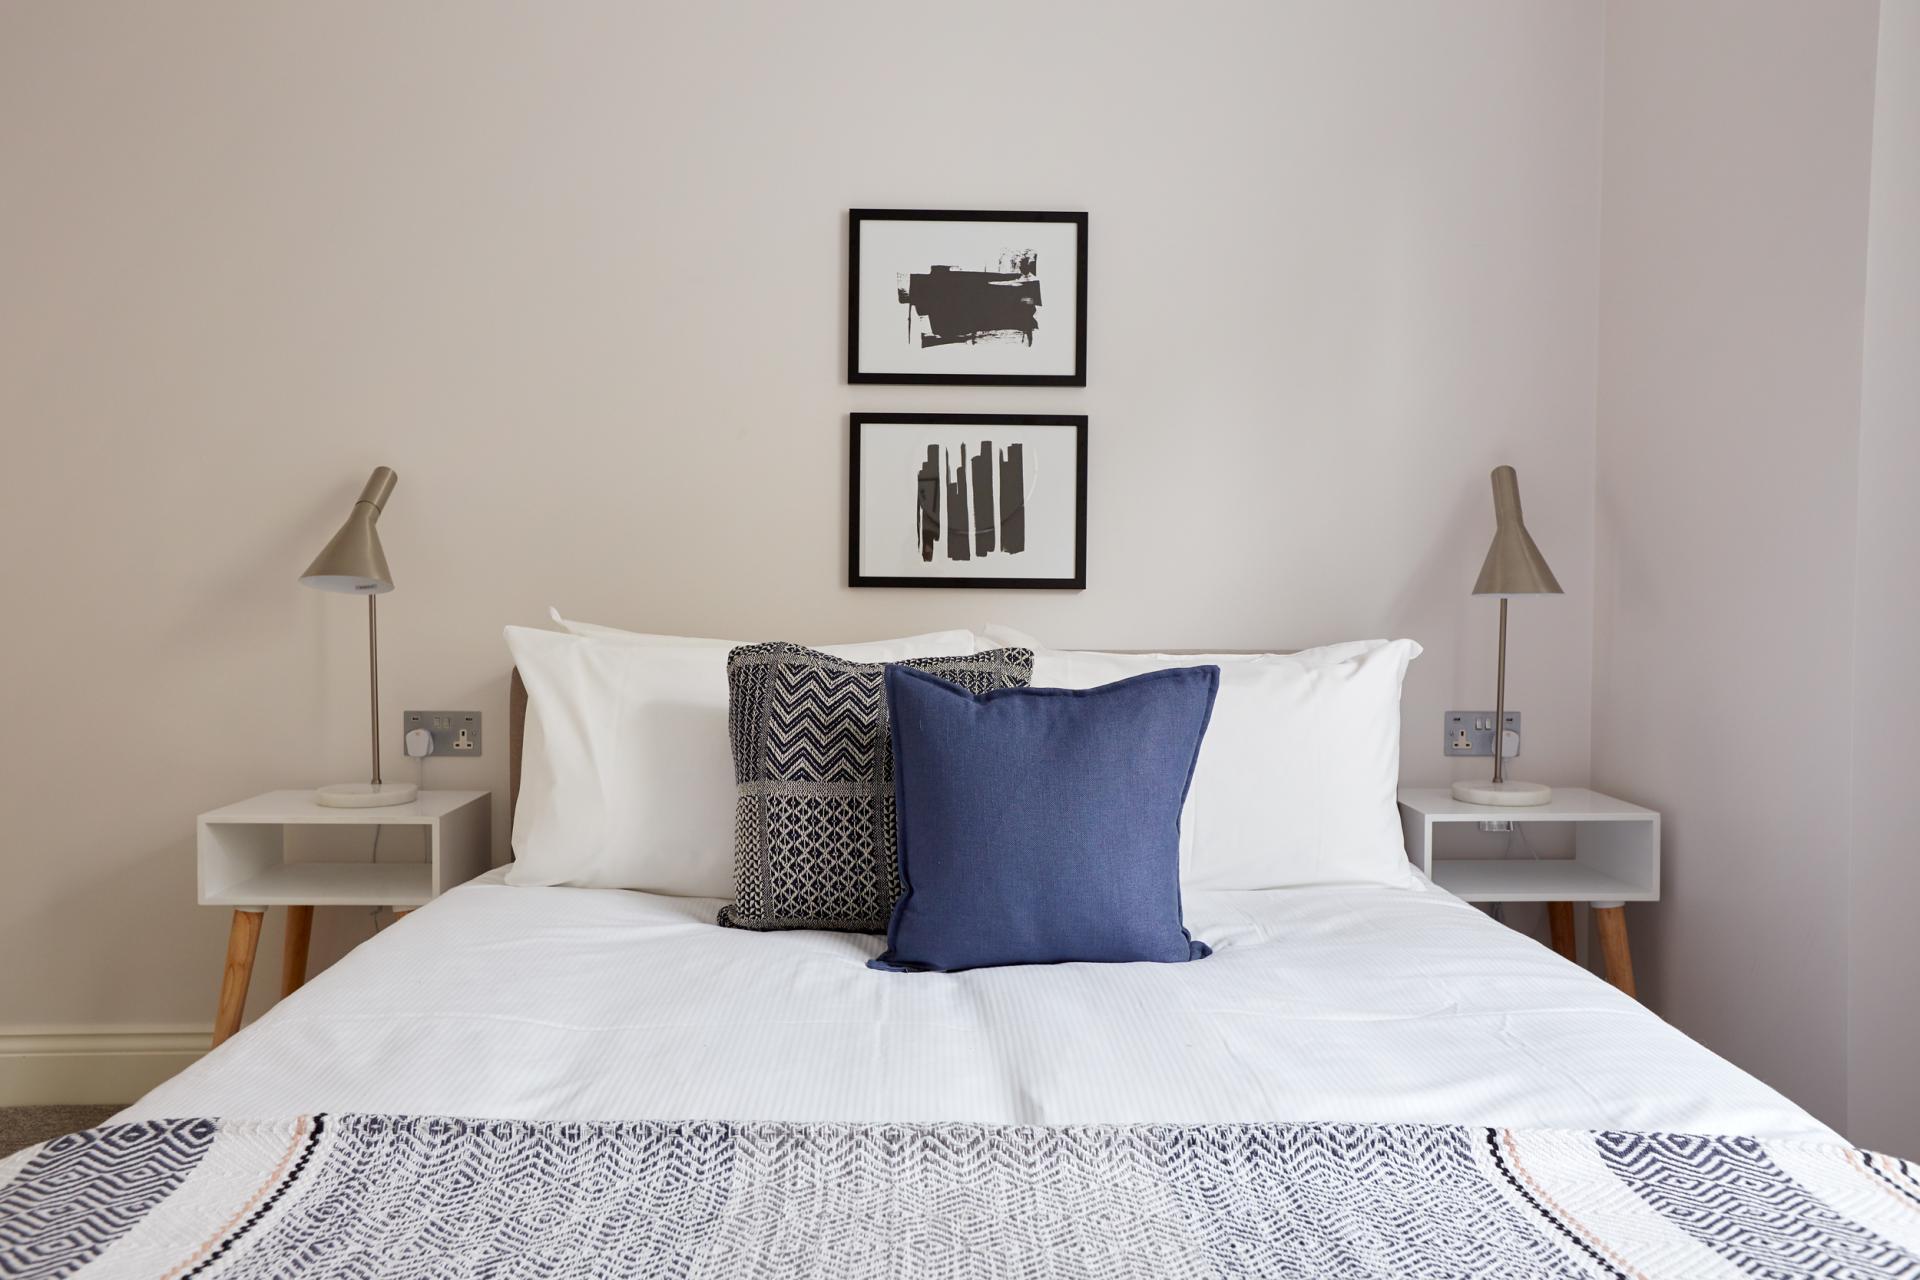 Bedding at Virginia House Apartments, Fitzrovia, London - Citybase Apartments